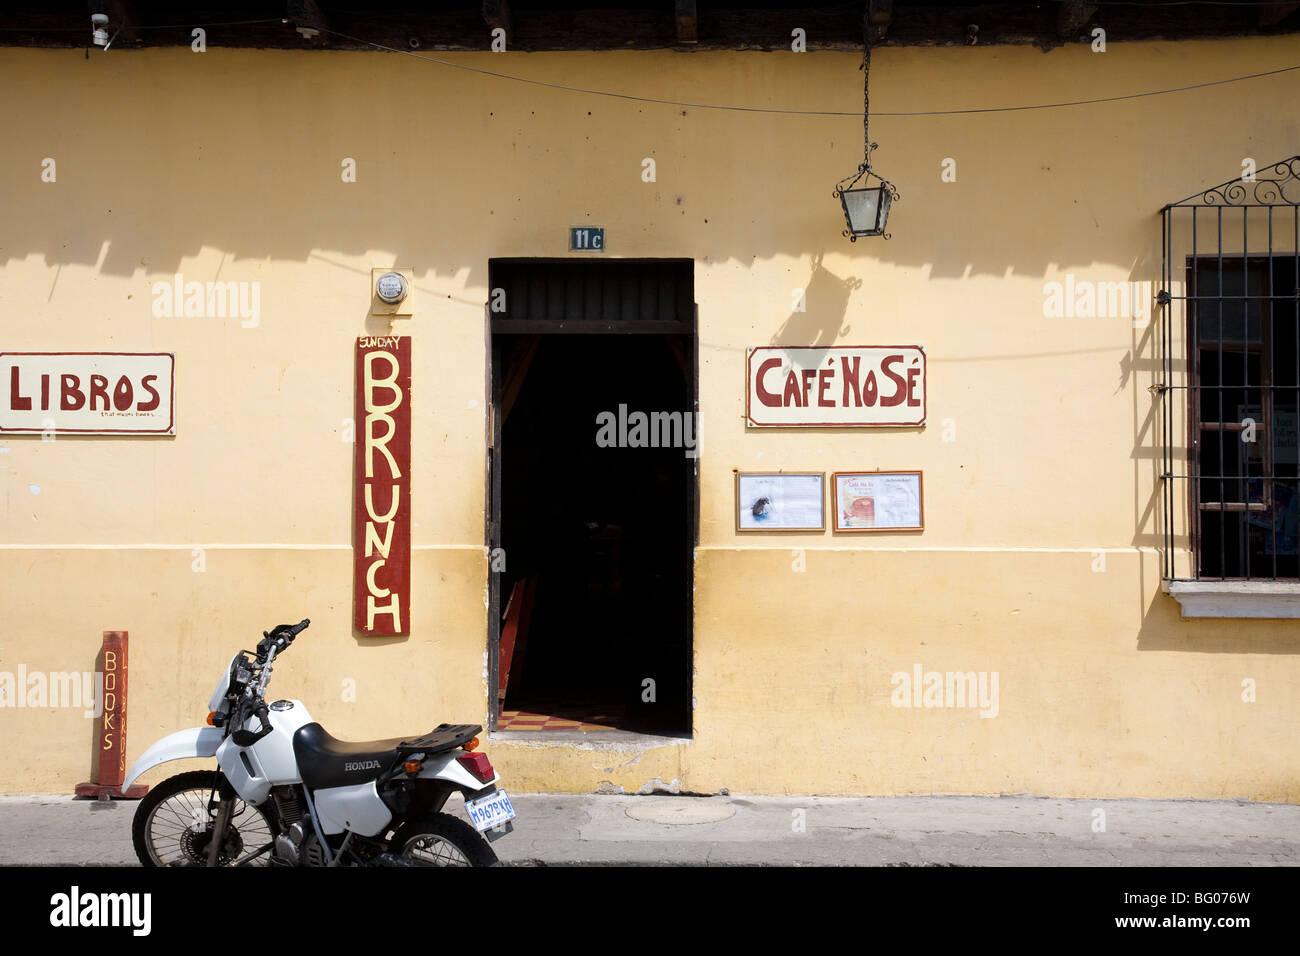 Cafe No Se Bar and Restaurant in Antigua Guatemala Stock Photo ...